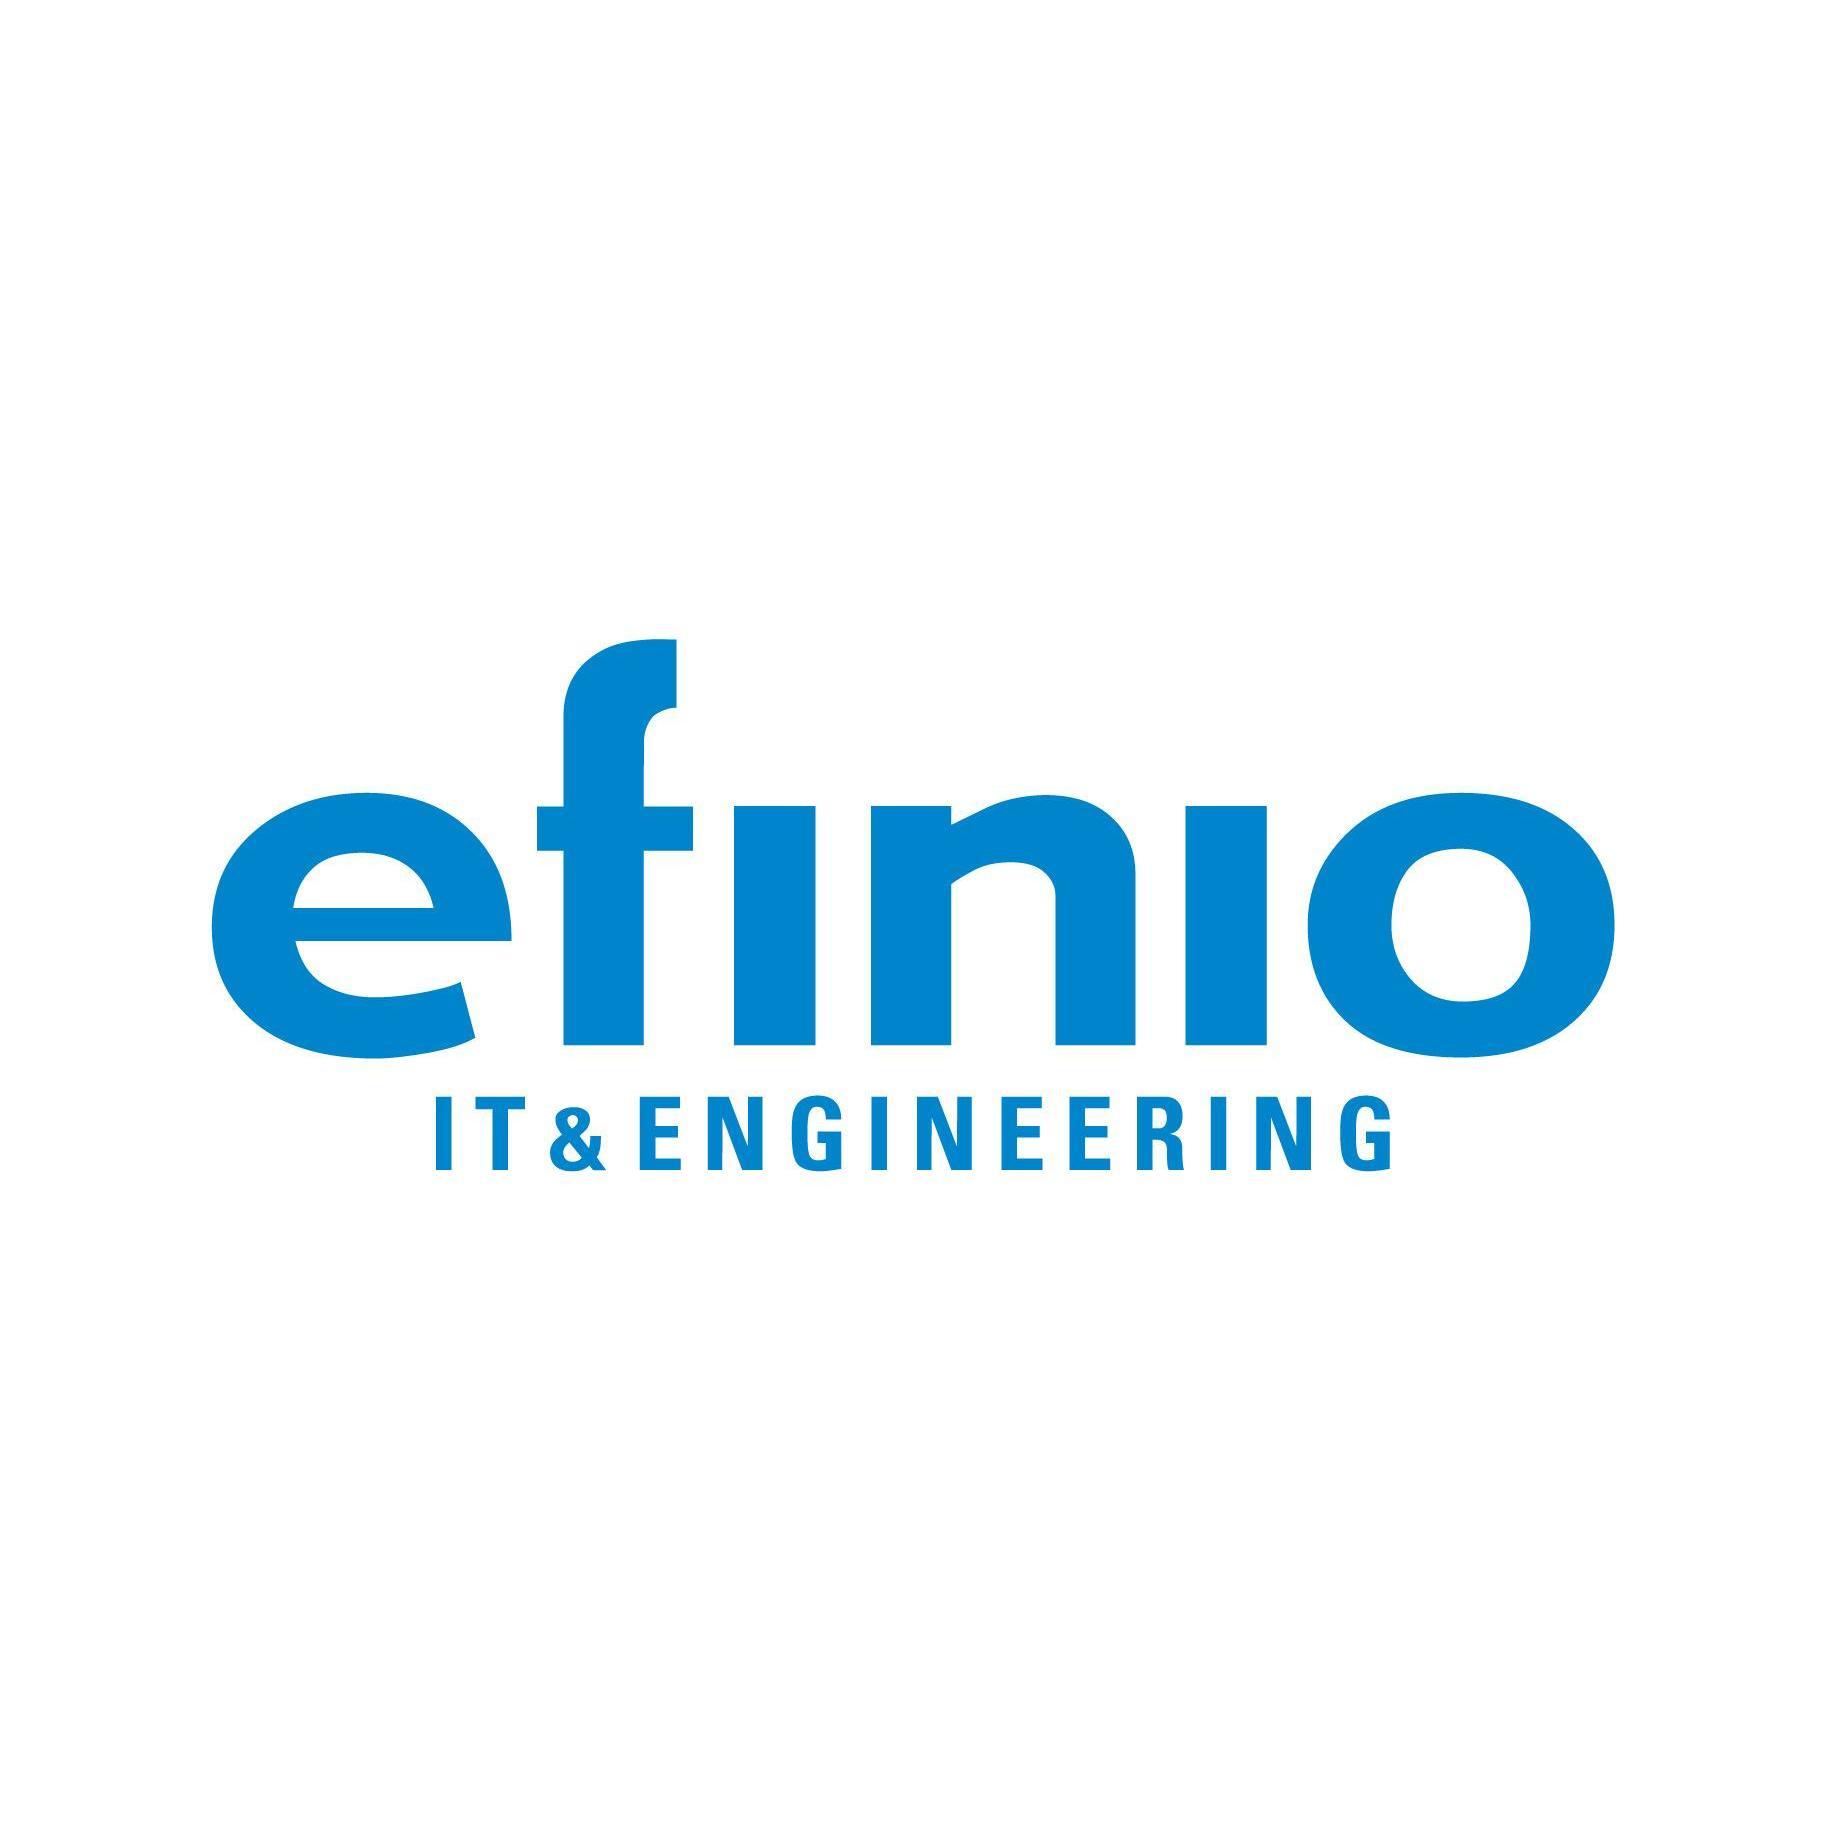 efinio IT & ENGINEERING